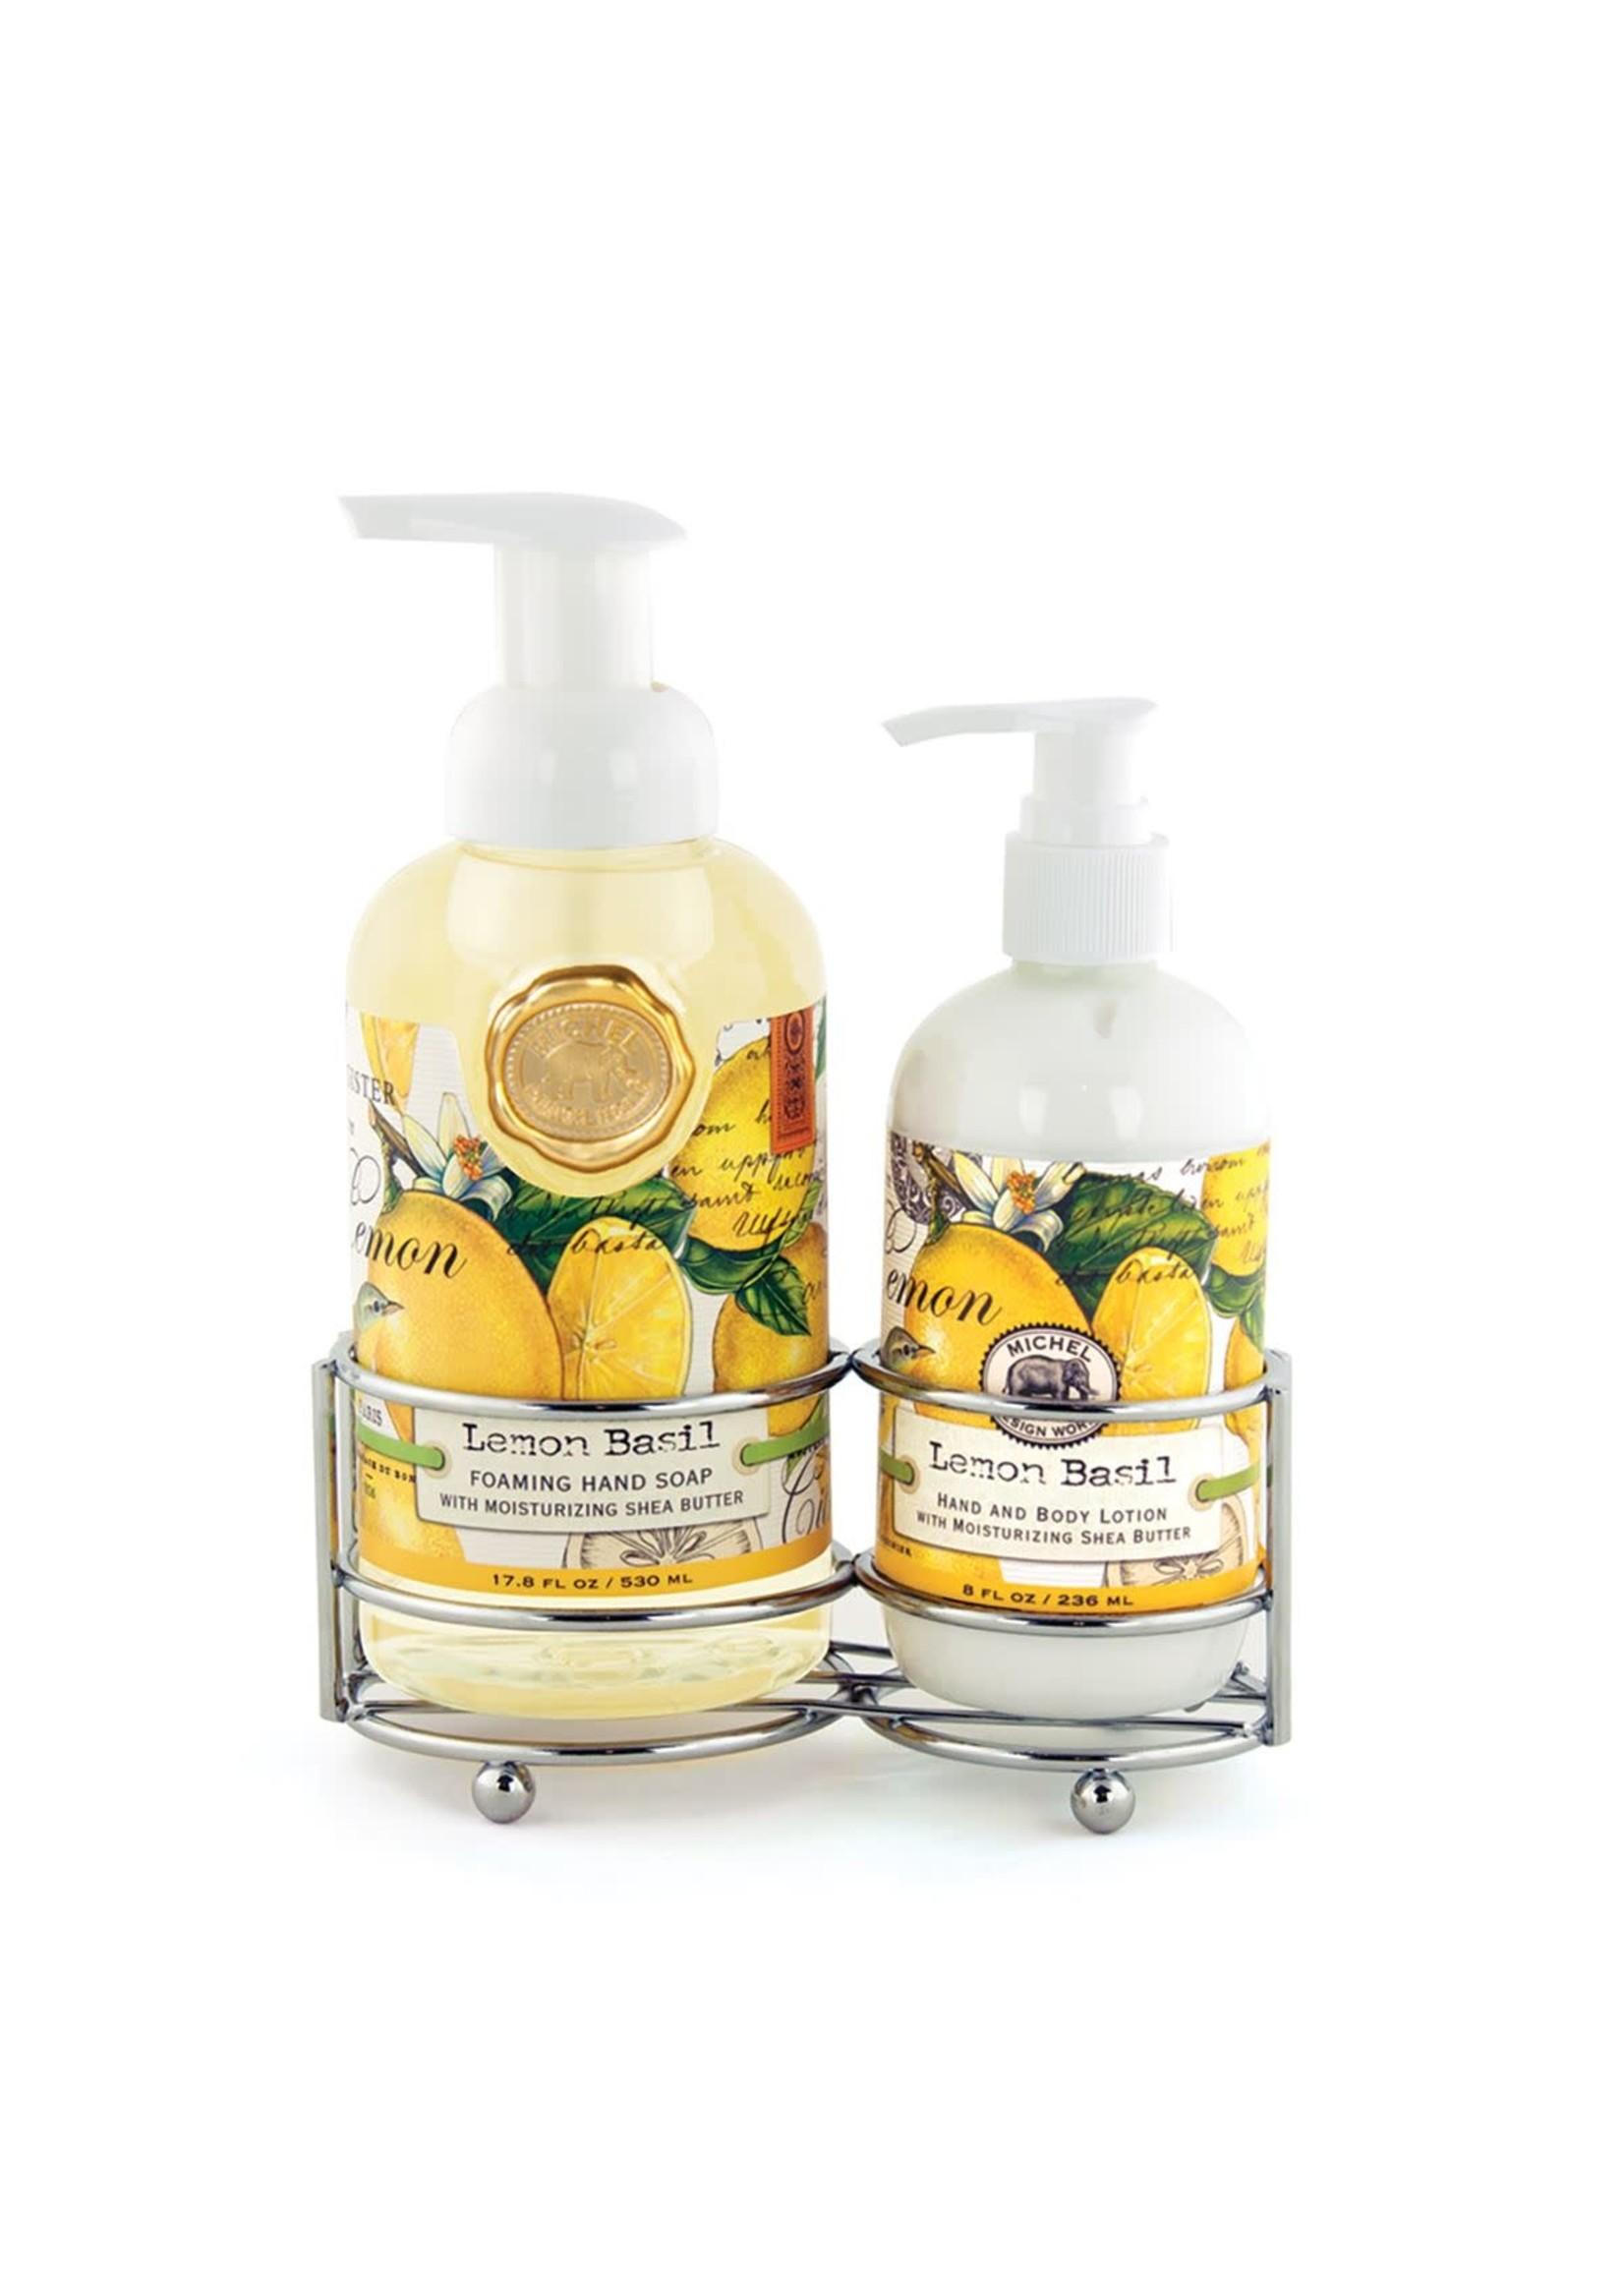 Michel Design Works Lemon Basil Handcare Caddy